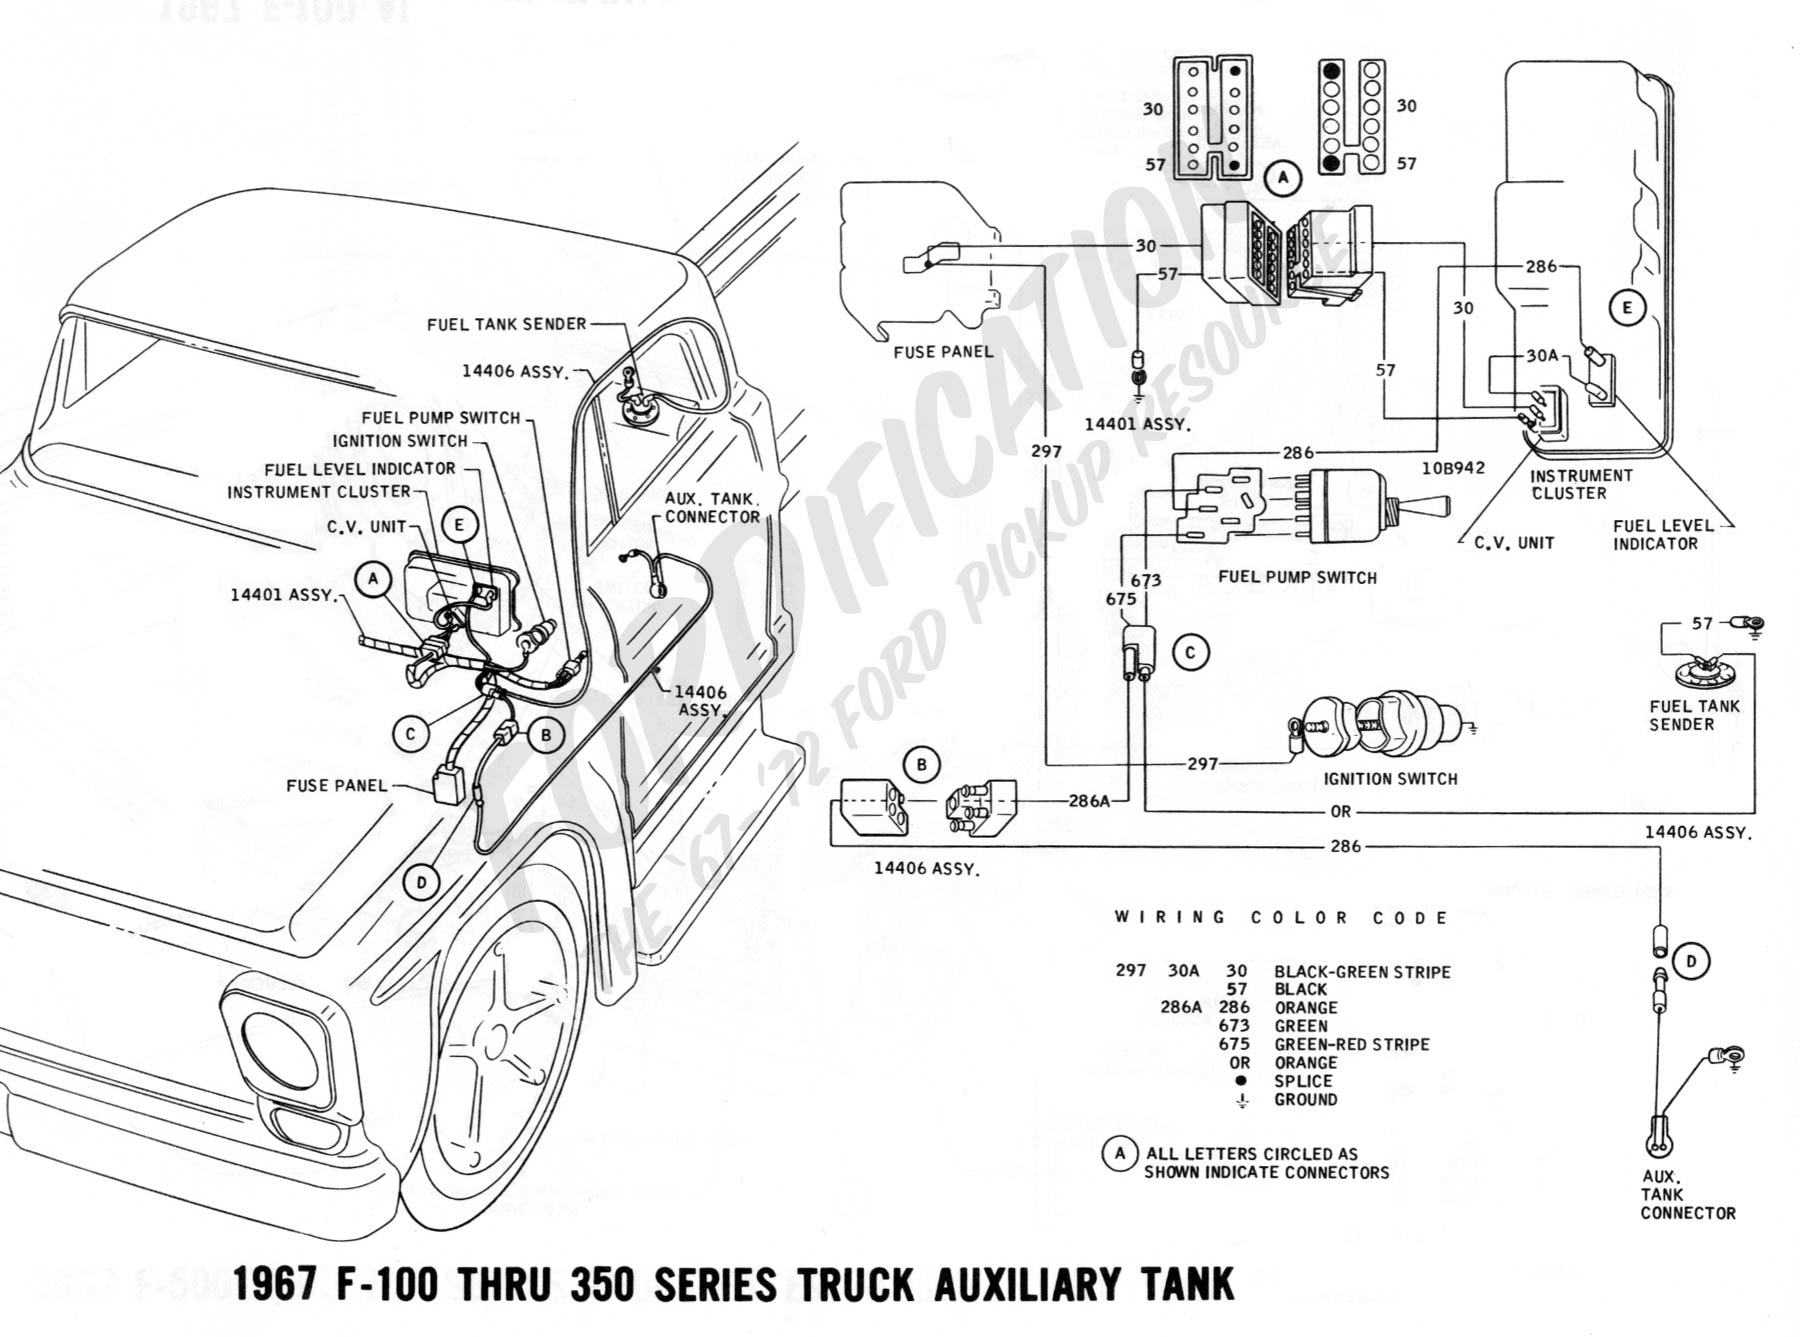 Mack Truck Dimmer Switch Wiring Rover 25 Rear Wiper Wiring Diagram 5pin Lalu Decorresine It